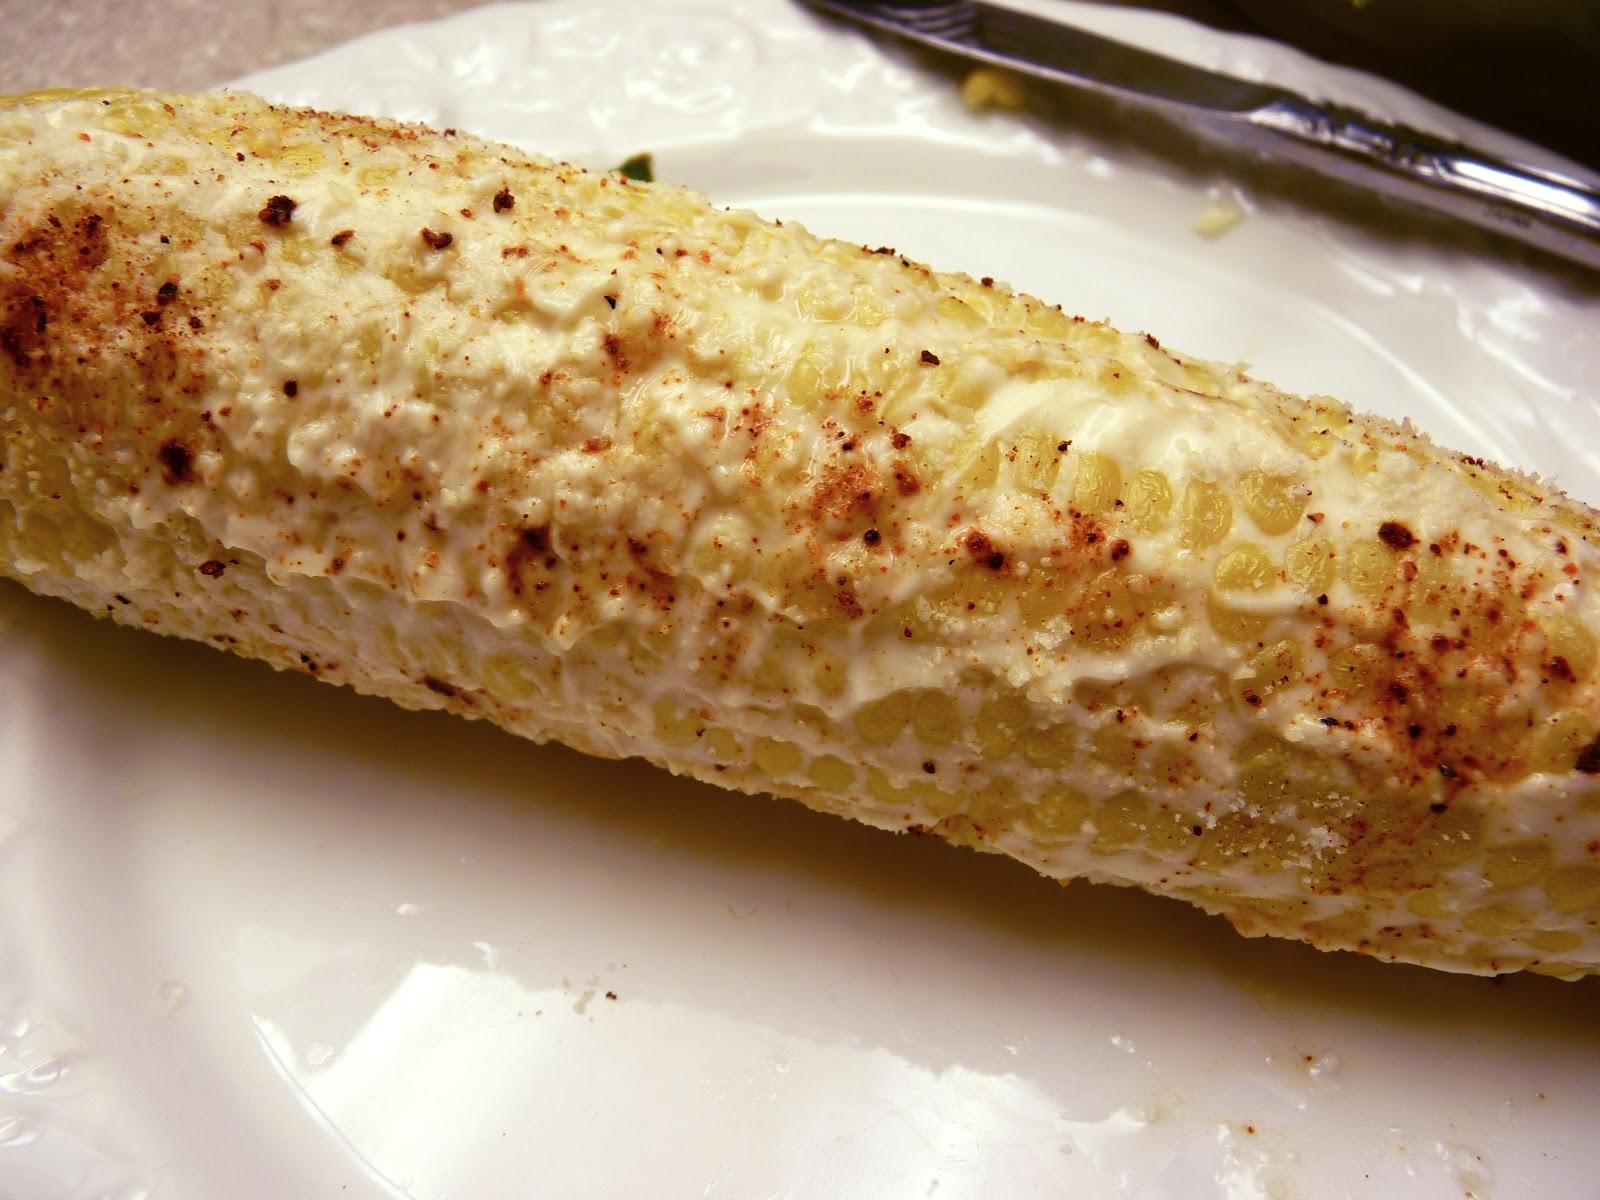 amelia.mary: I Made Southwest Corn on the Cob